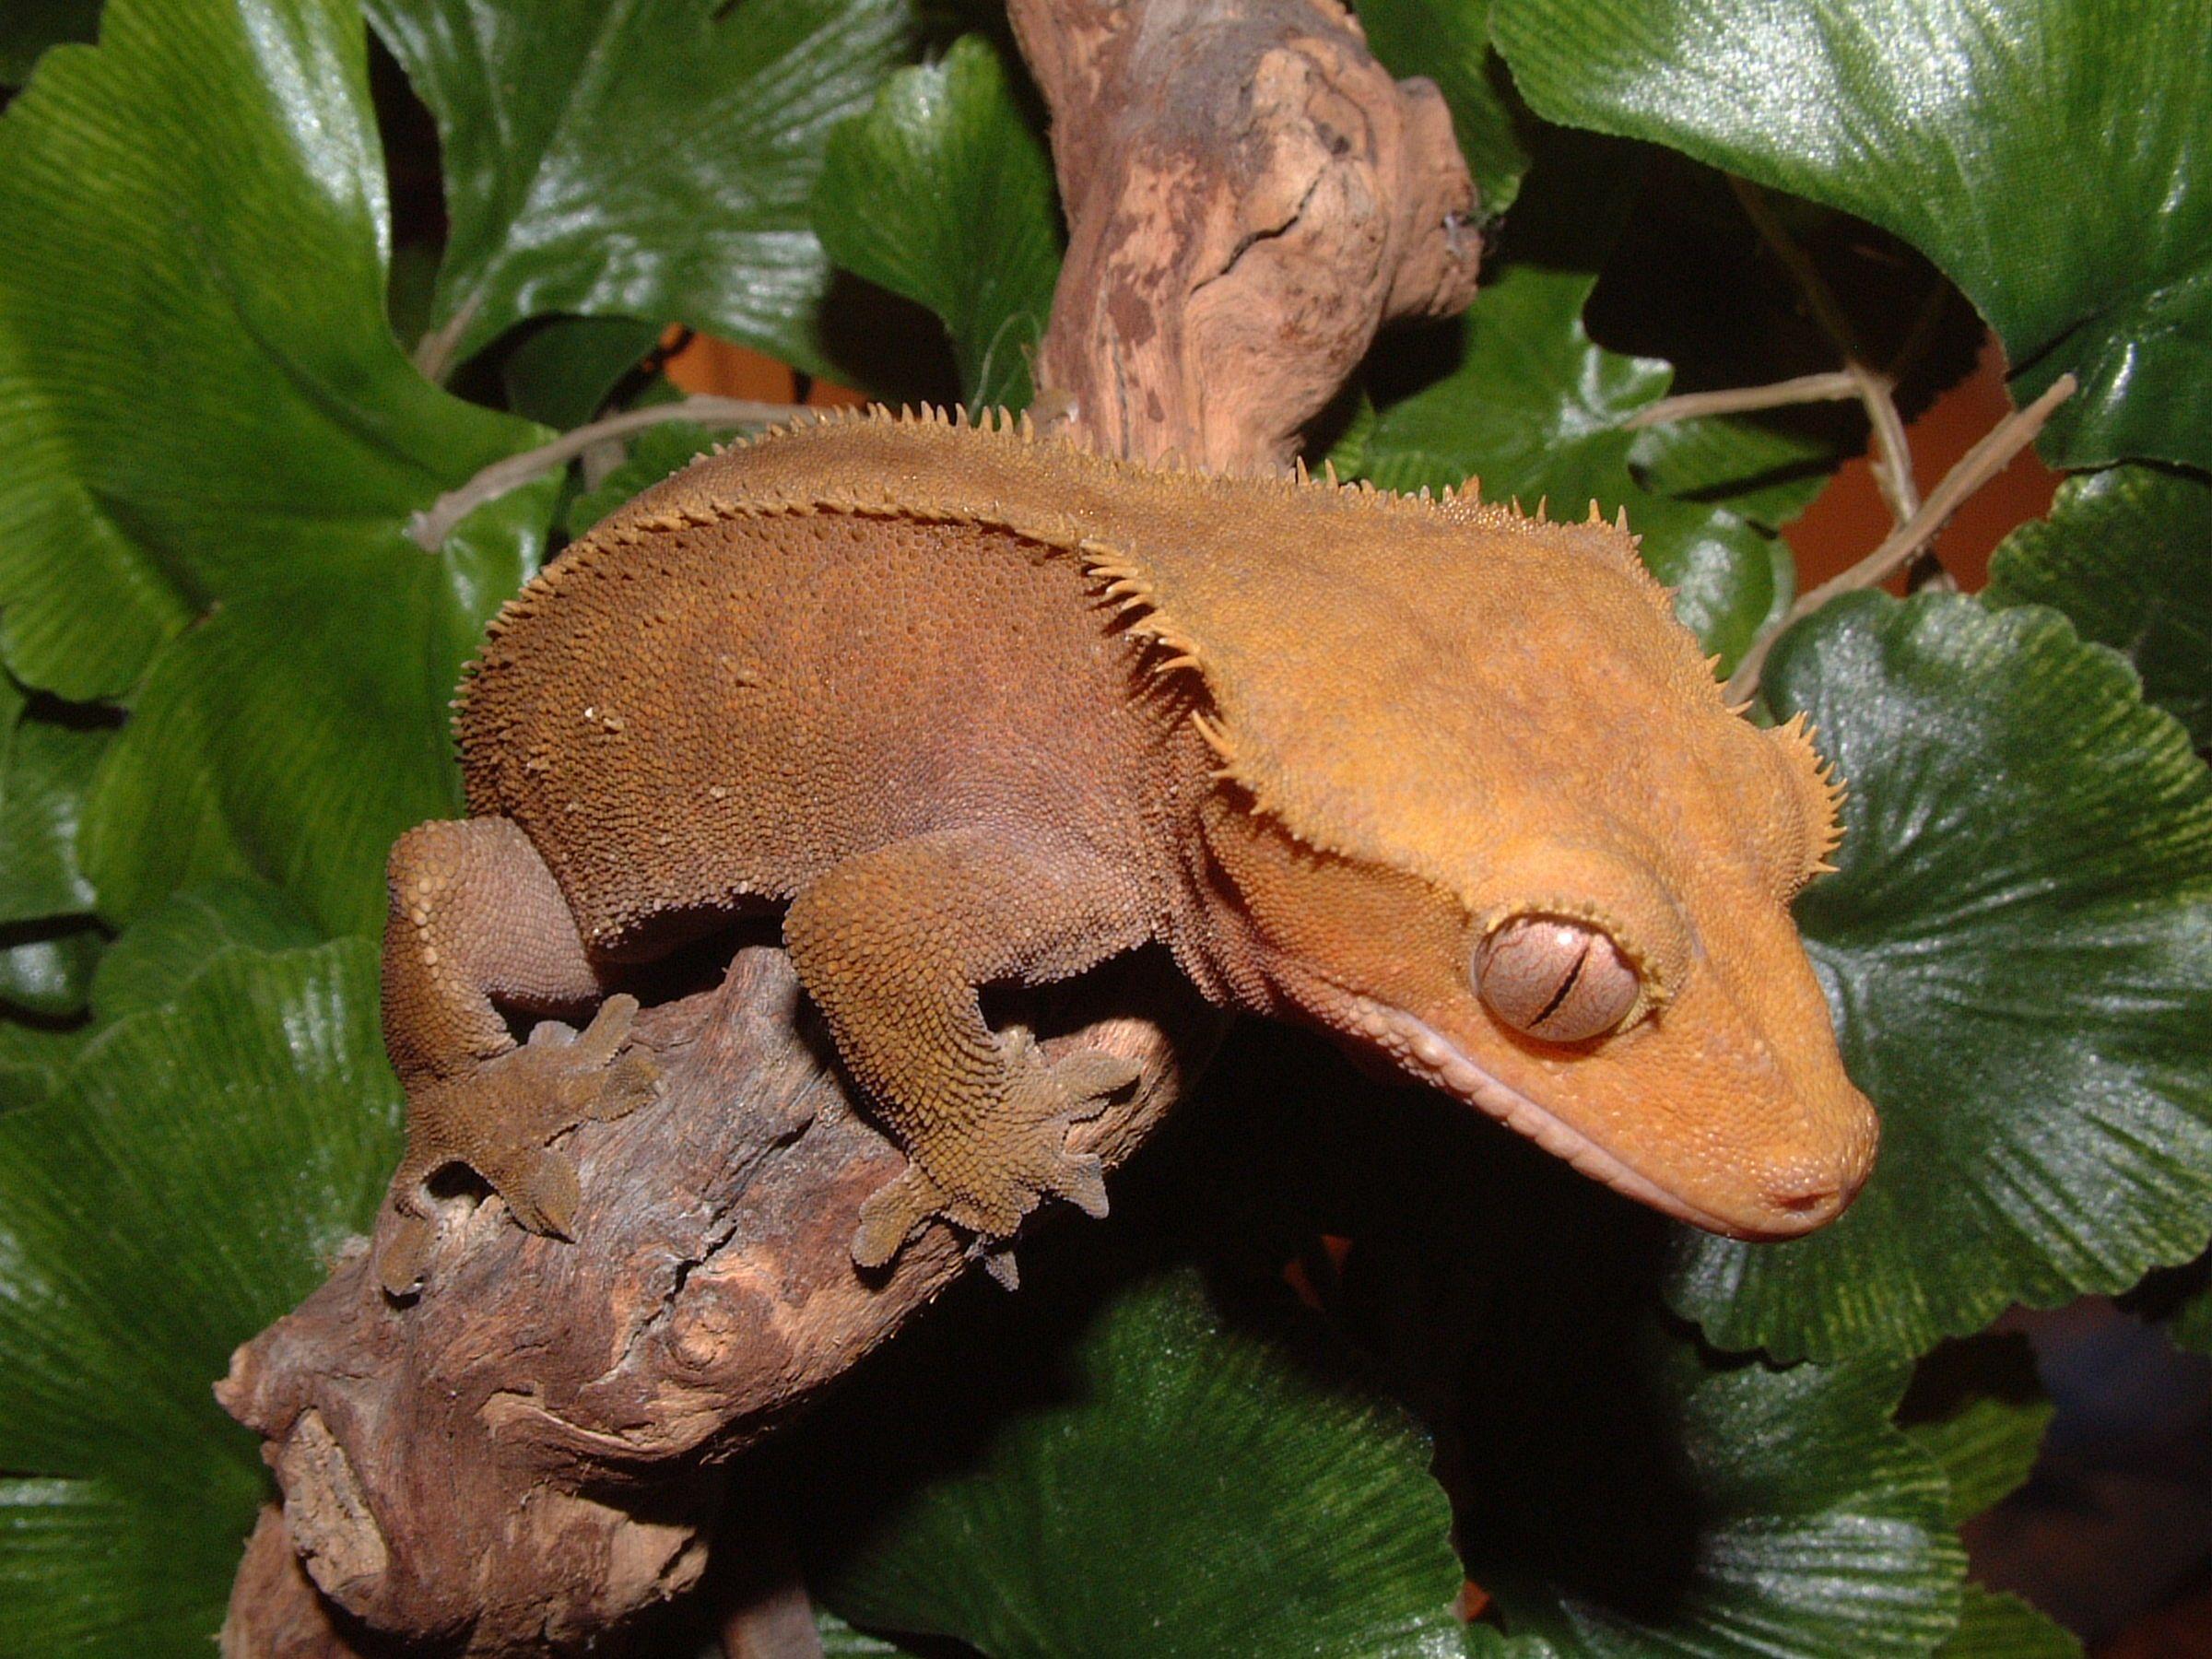 Crested gecko at Northampton Reptile Centre Reptiles pet